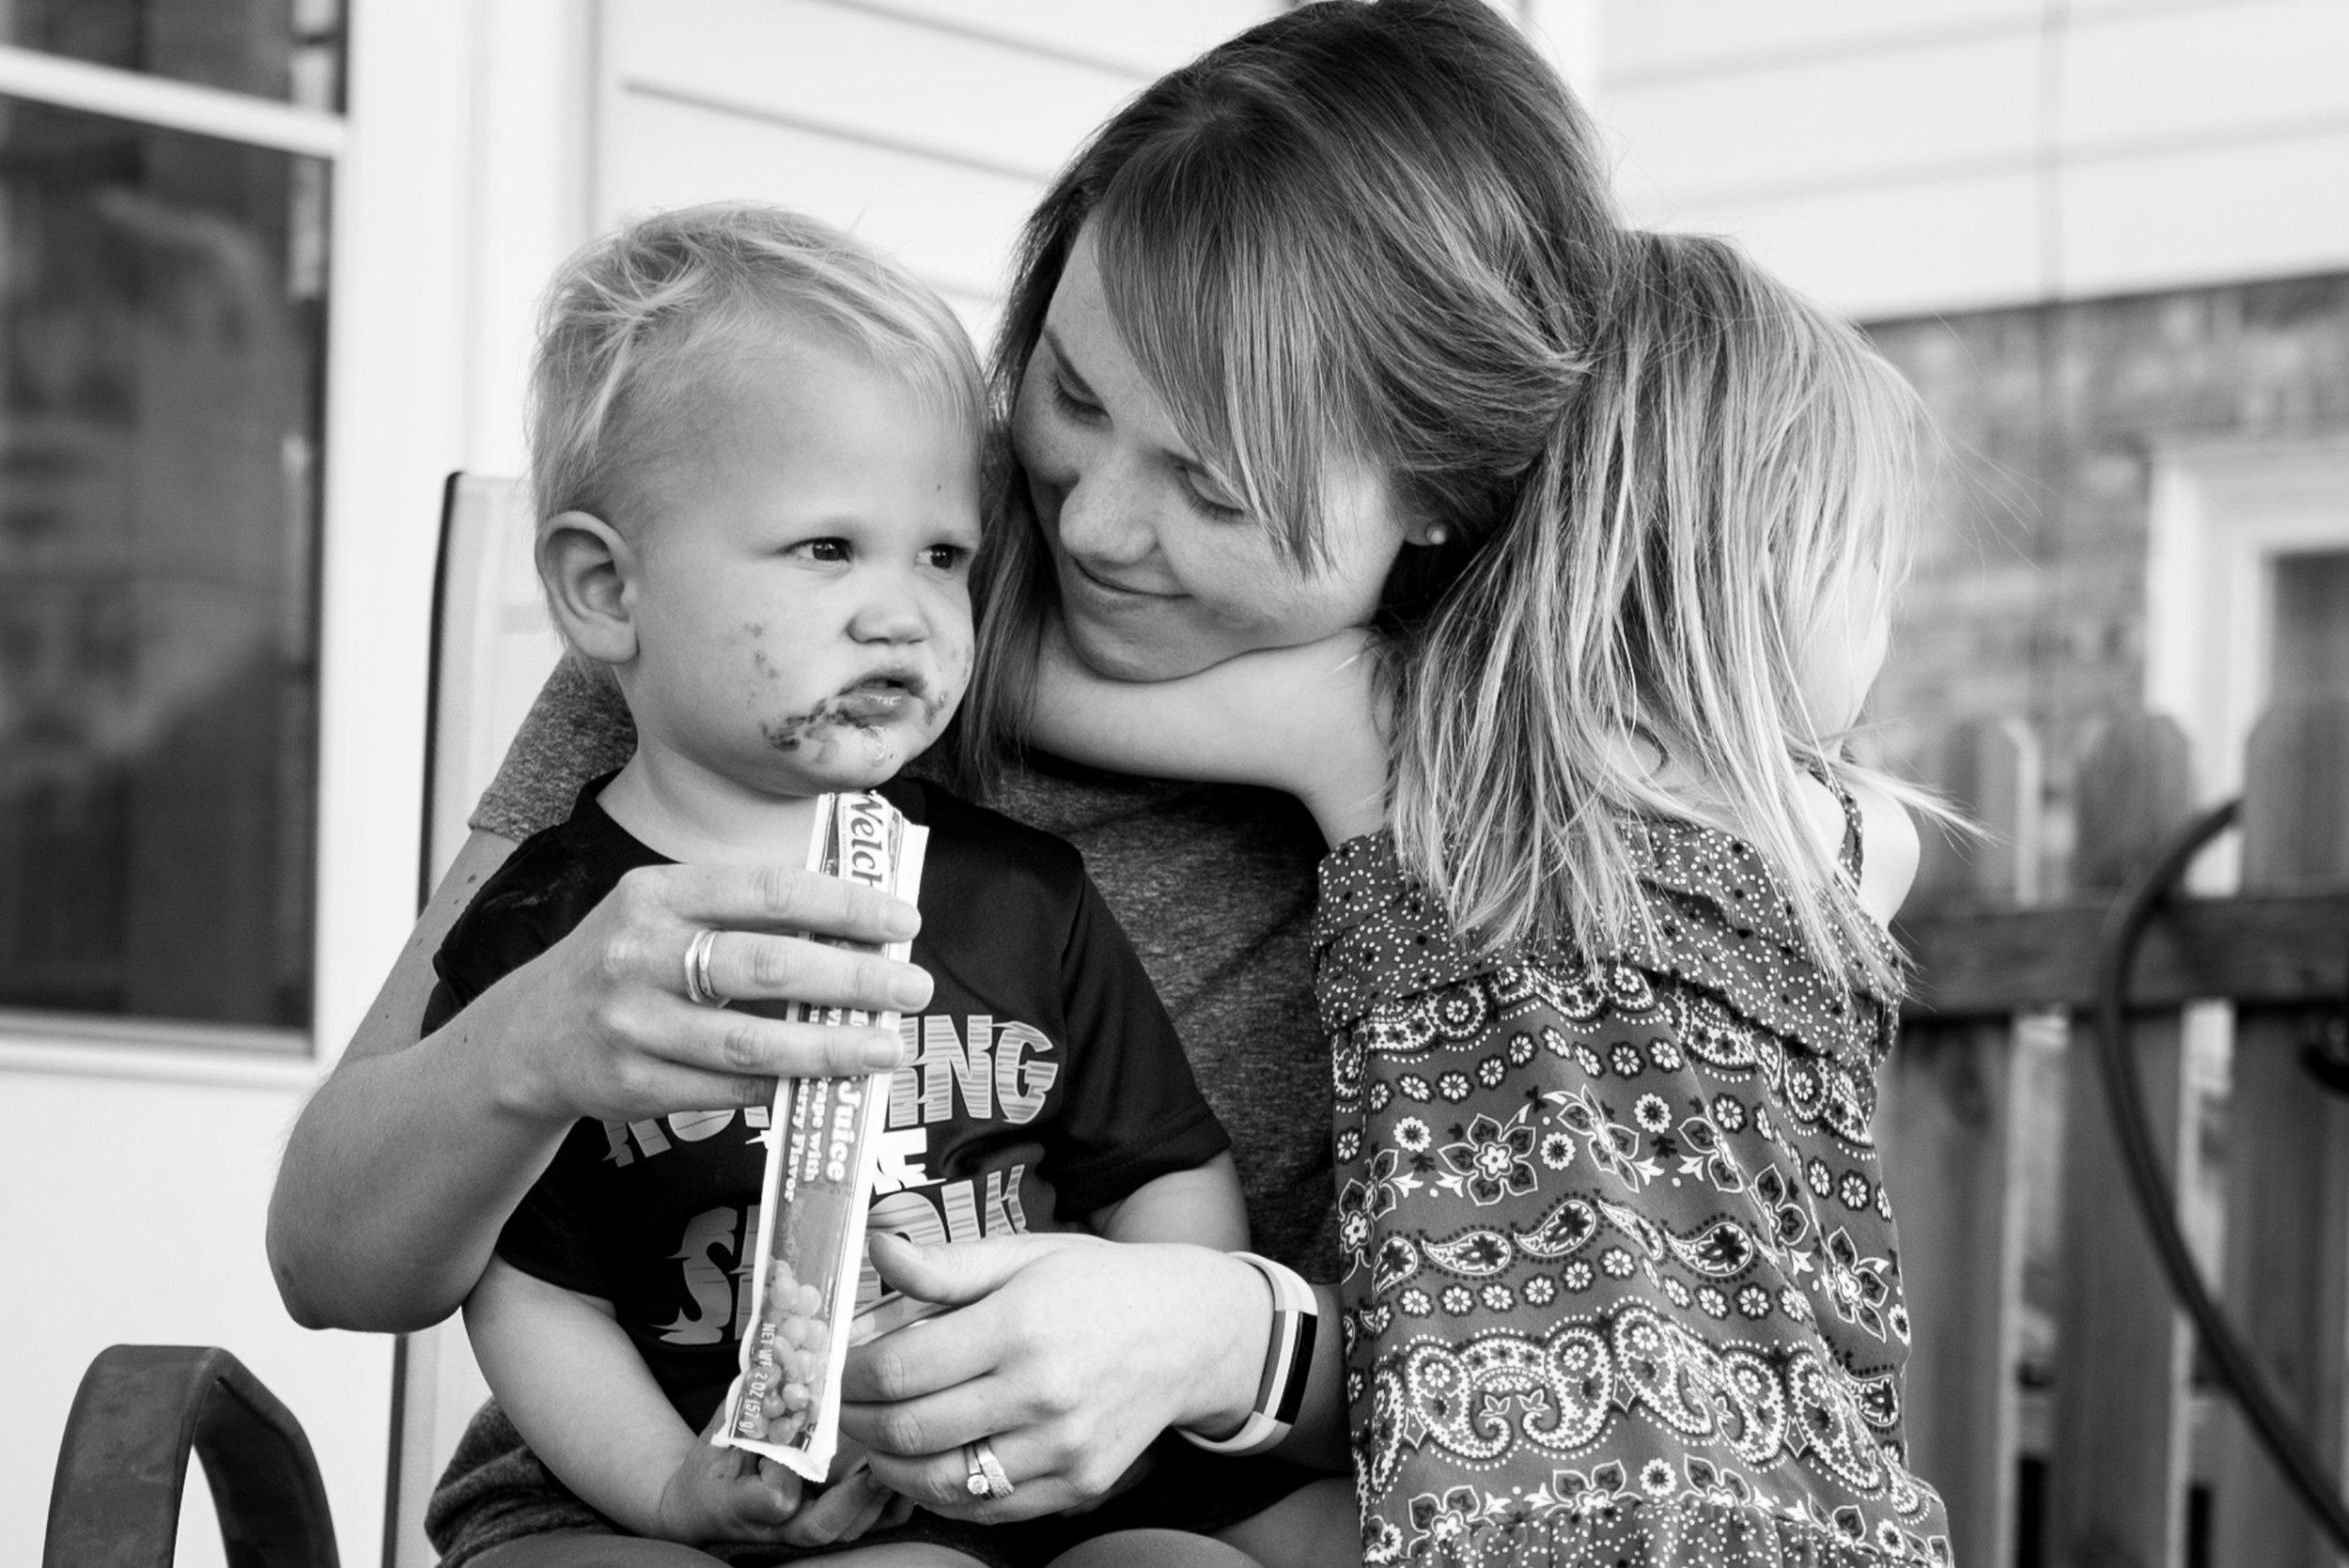 Kari Gierach Photography, Milwaukee Wisconsin documentary family photographer, Wauwatosa candid family photo, mom and kids hugging-1.jpg